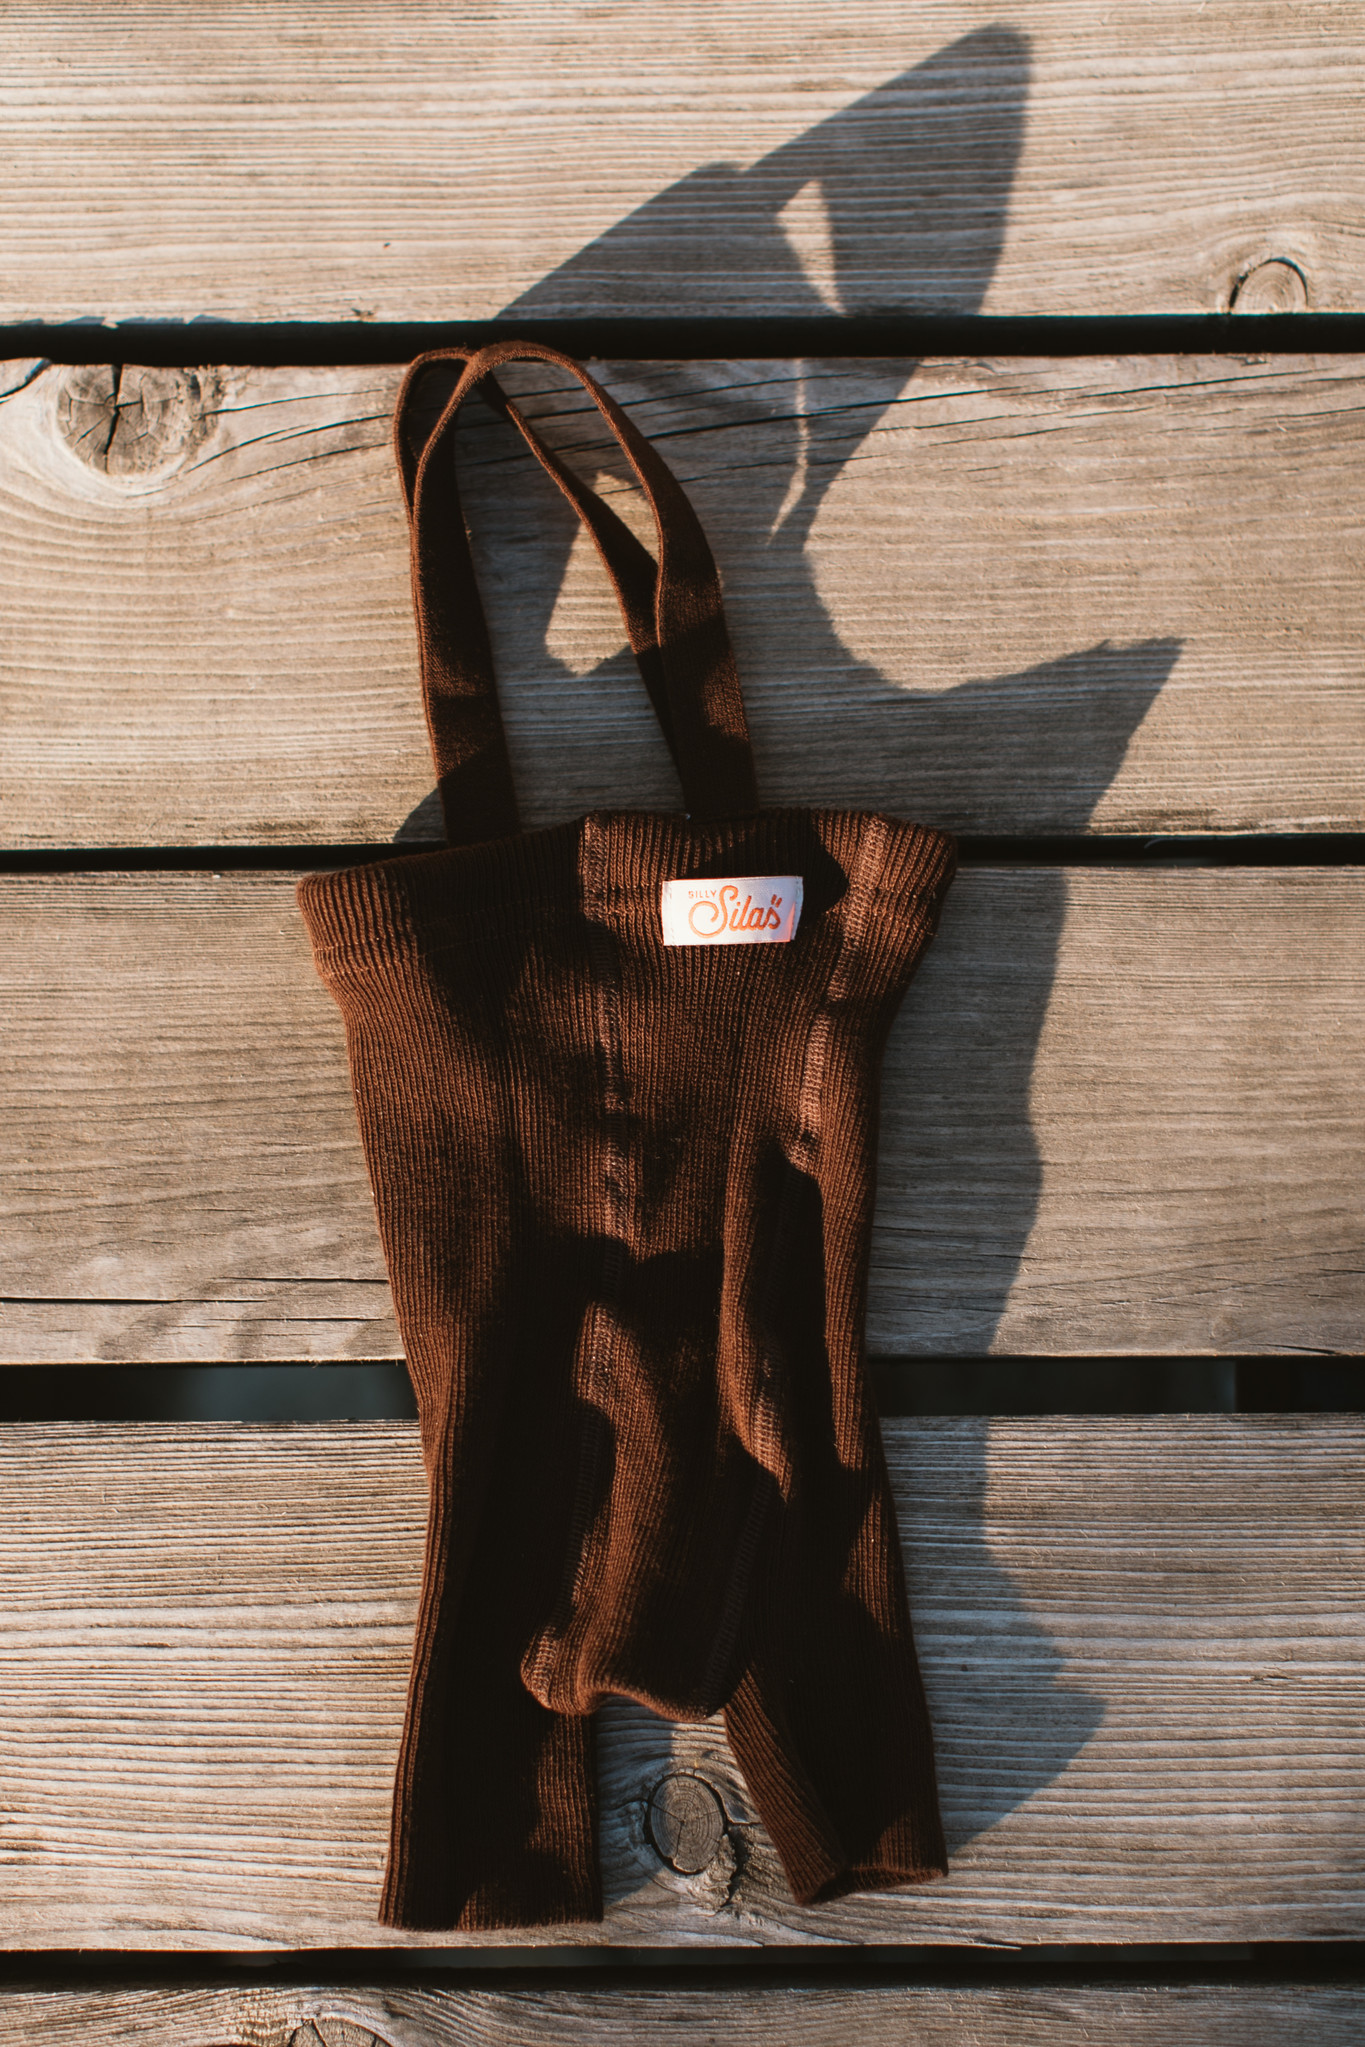 Silly Silas - korte maillot/ shorts met bretels - 100% katoen - chocolate brown -  0 tm 3 jaar